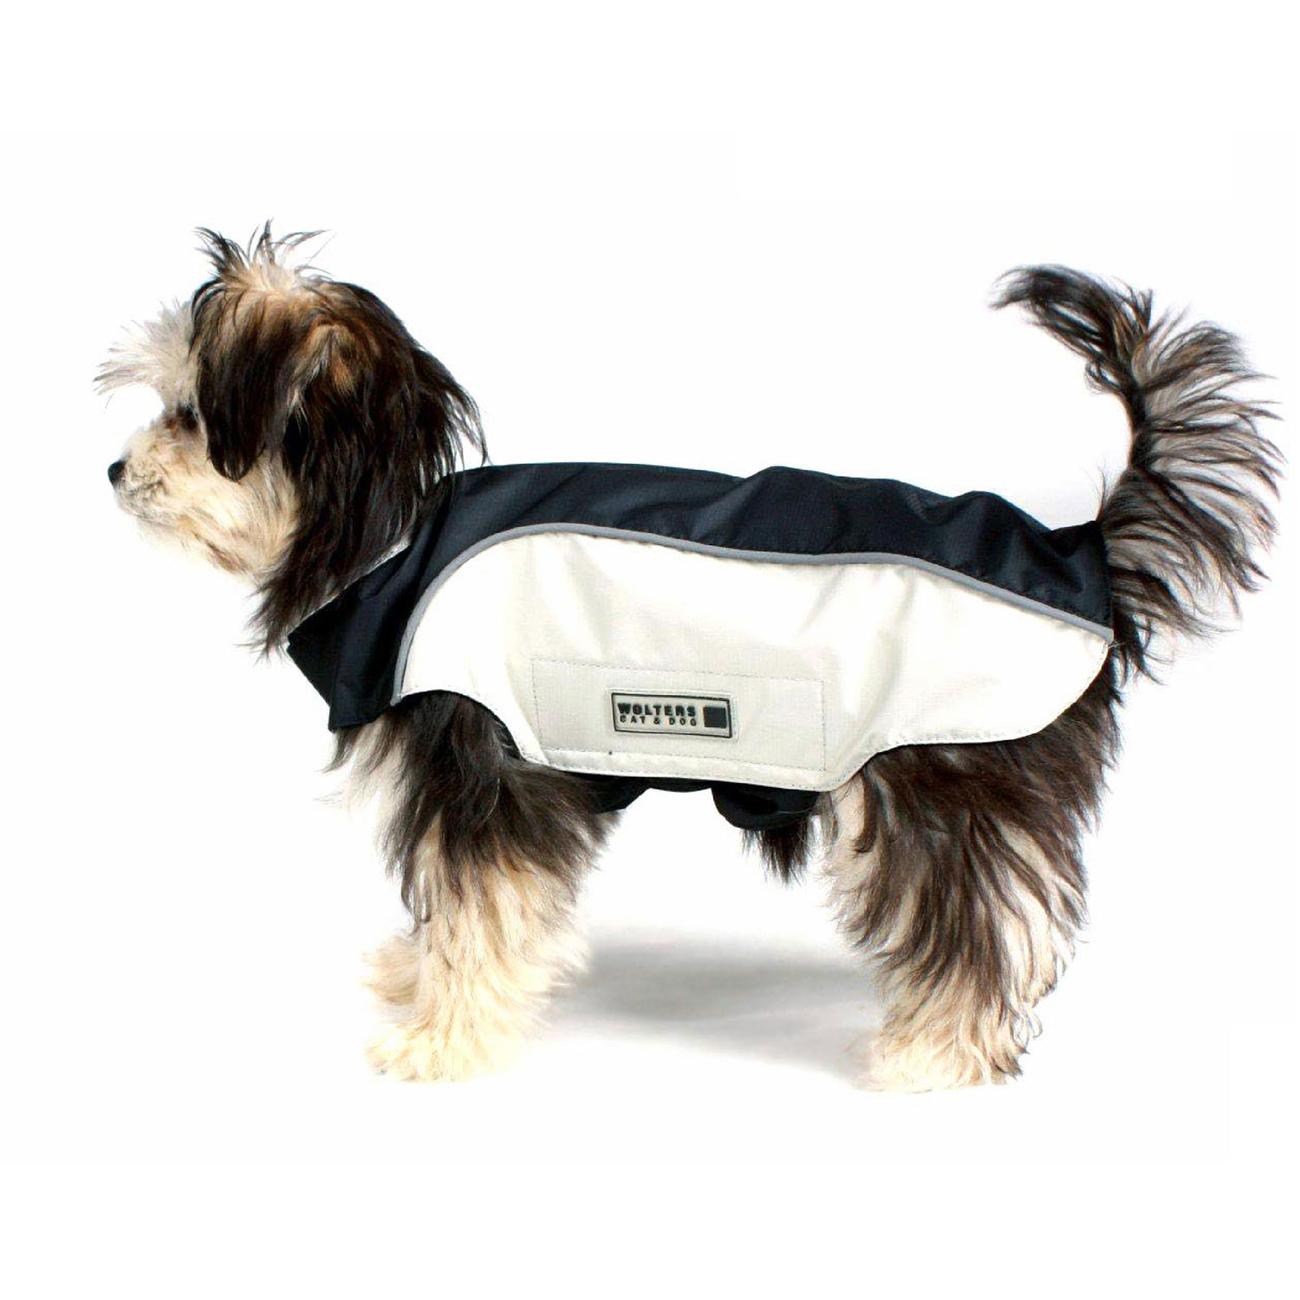 Wolters Regenjacke für Hunde Easy Rain, Bild 12